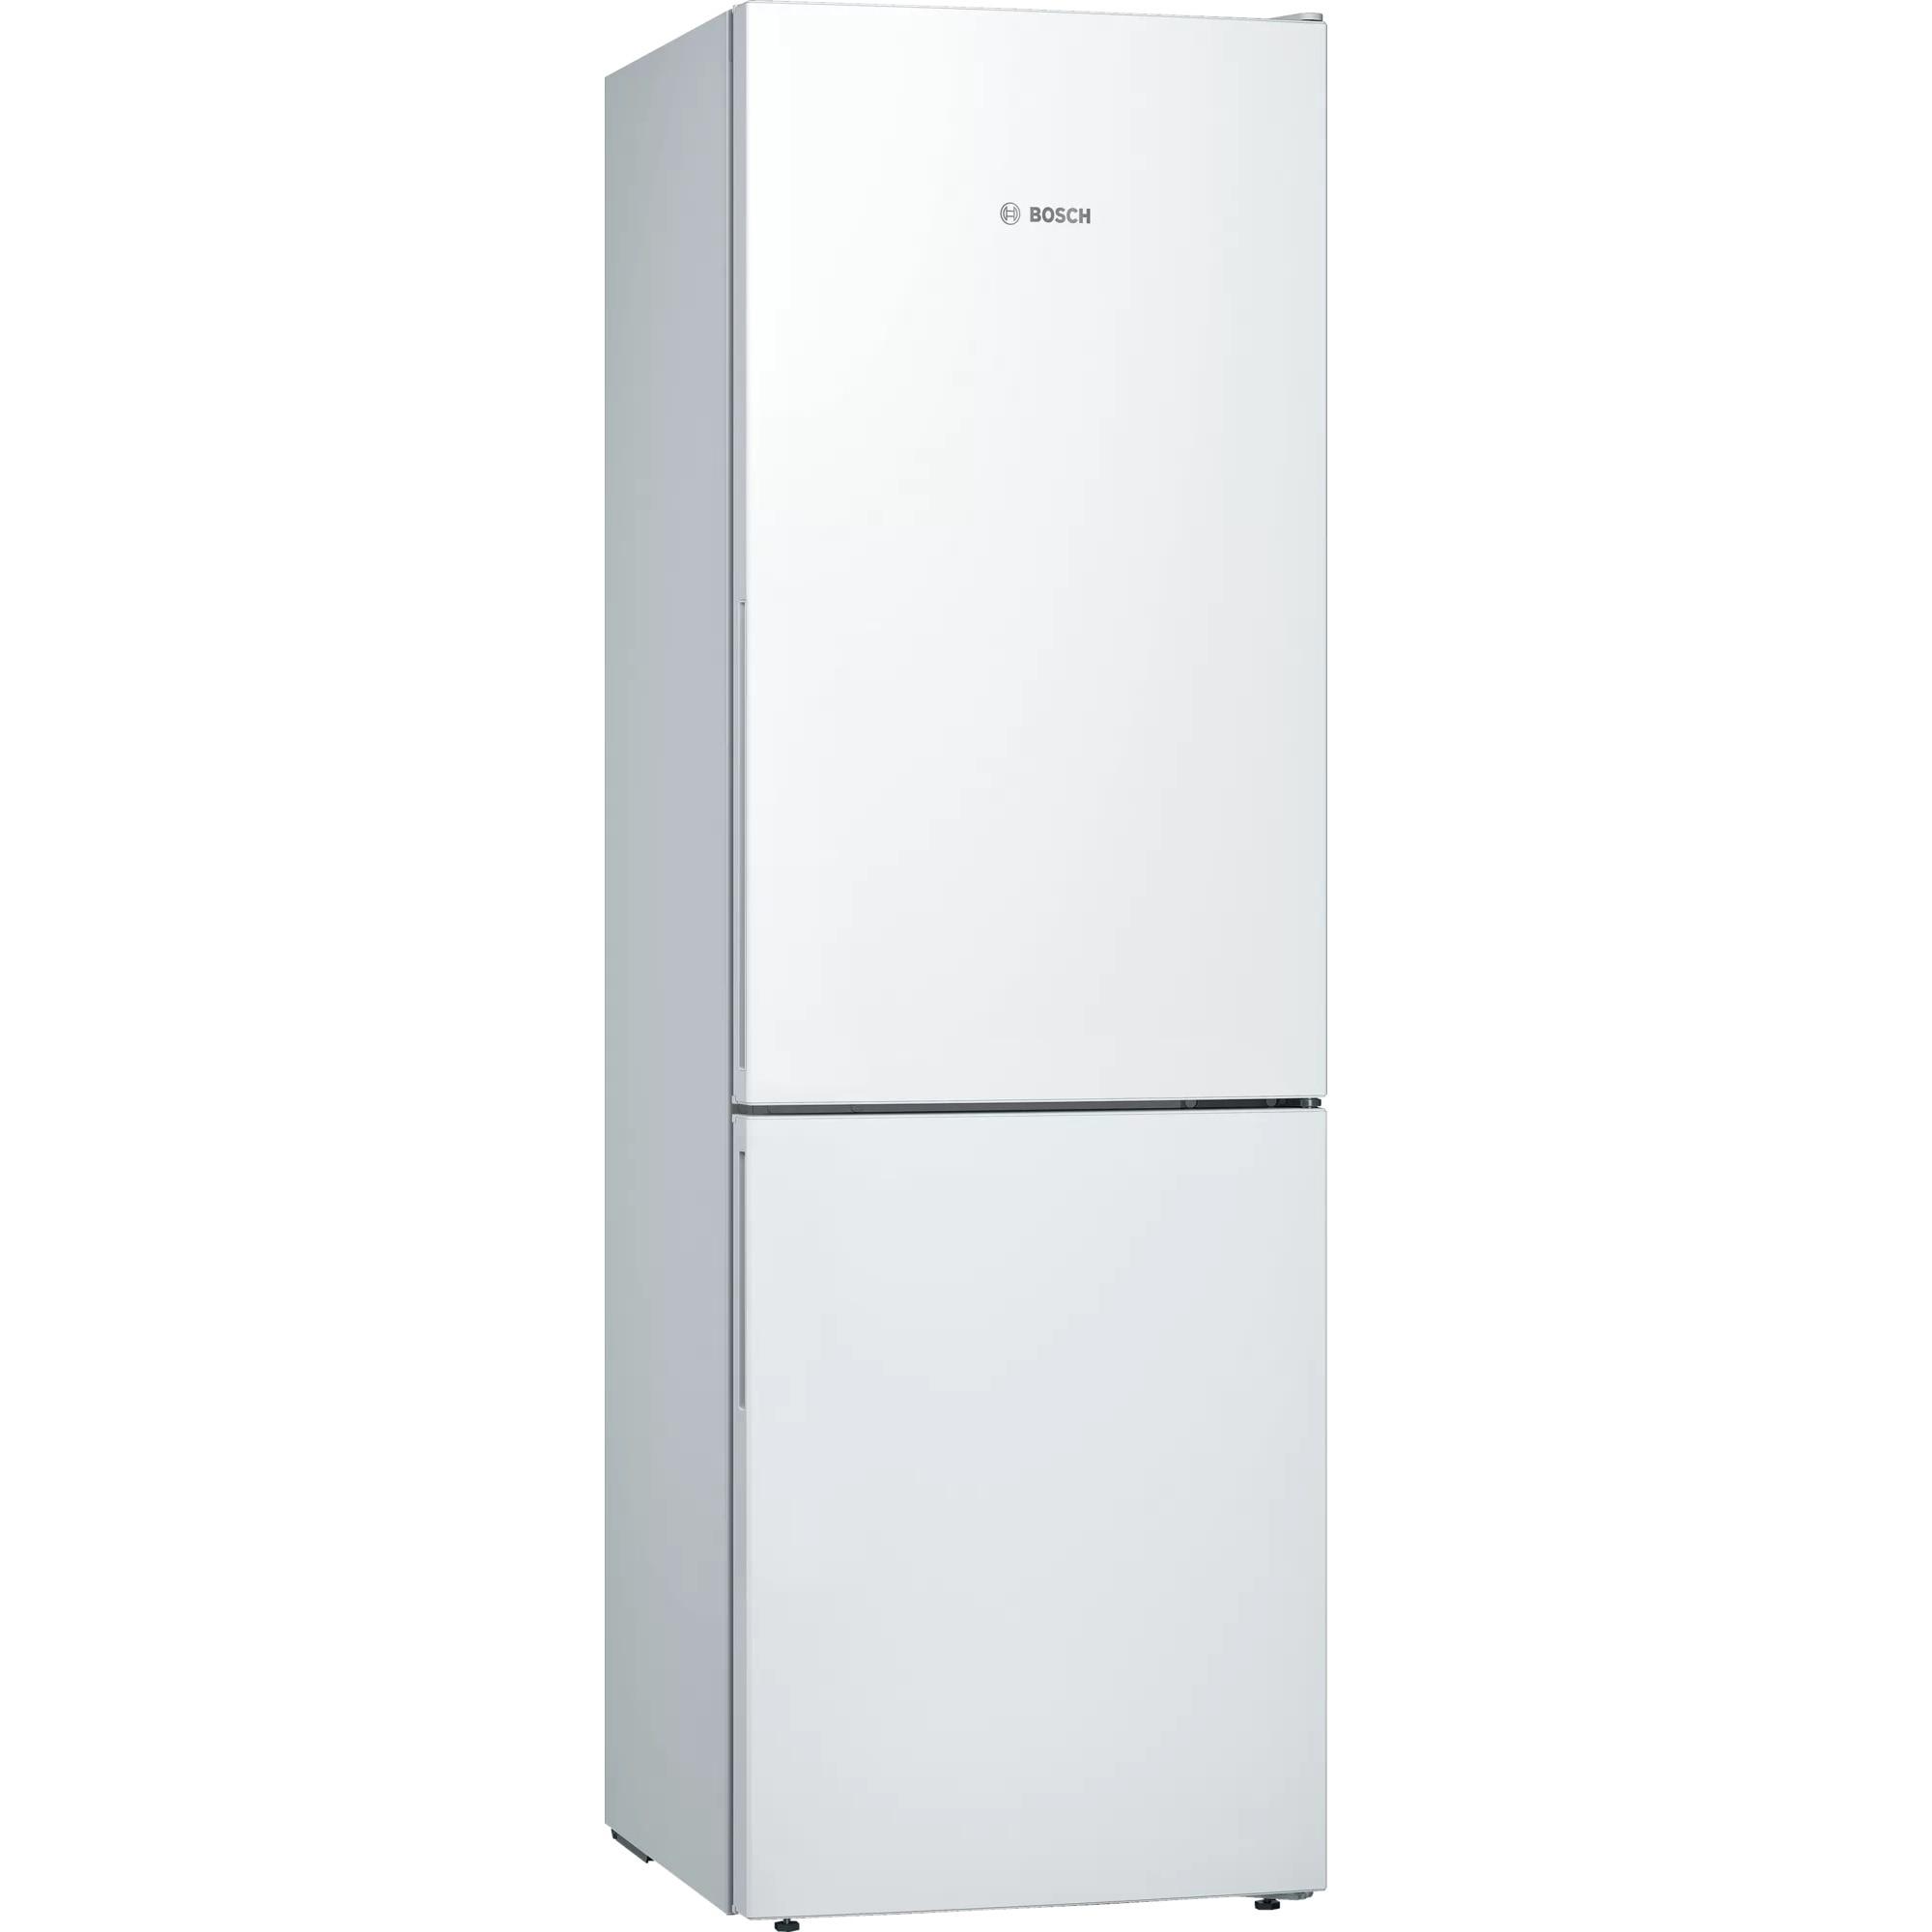 Fotografie Combina frigorifica Bosch KGE36AWCA , 308 l, Clasa C, Low Frost, VitaFresh, H 186 cm, Alb